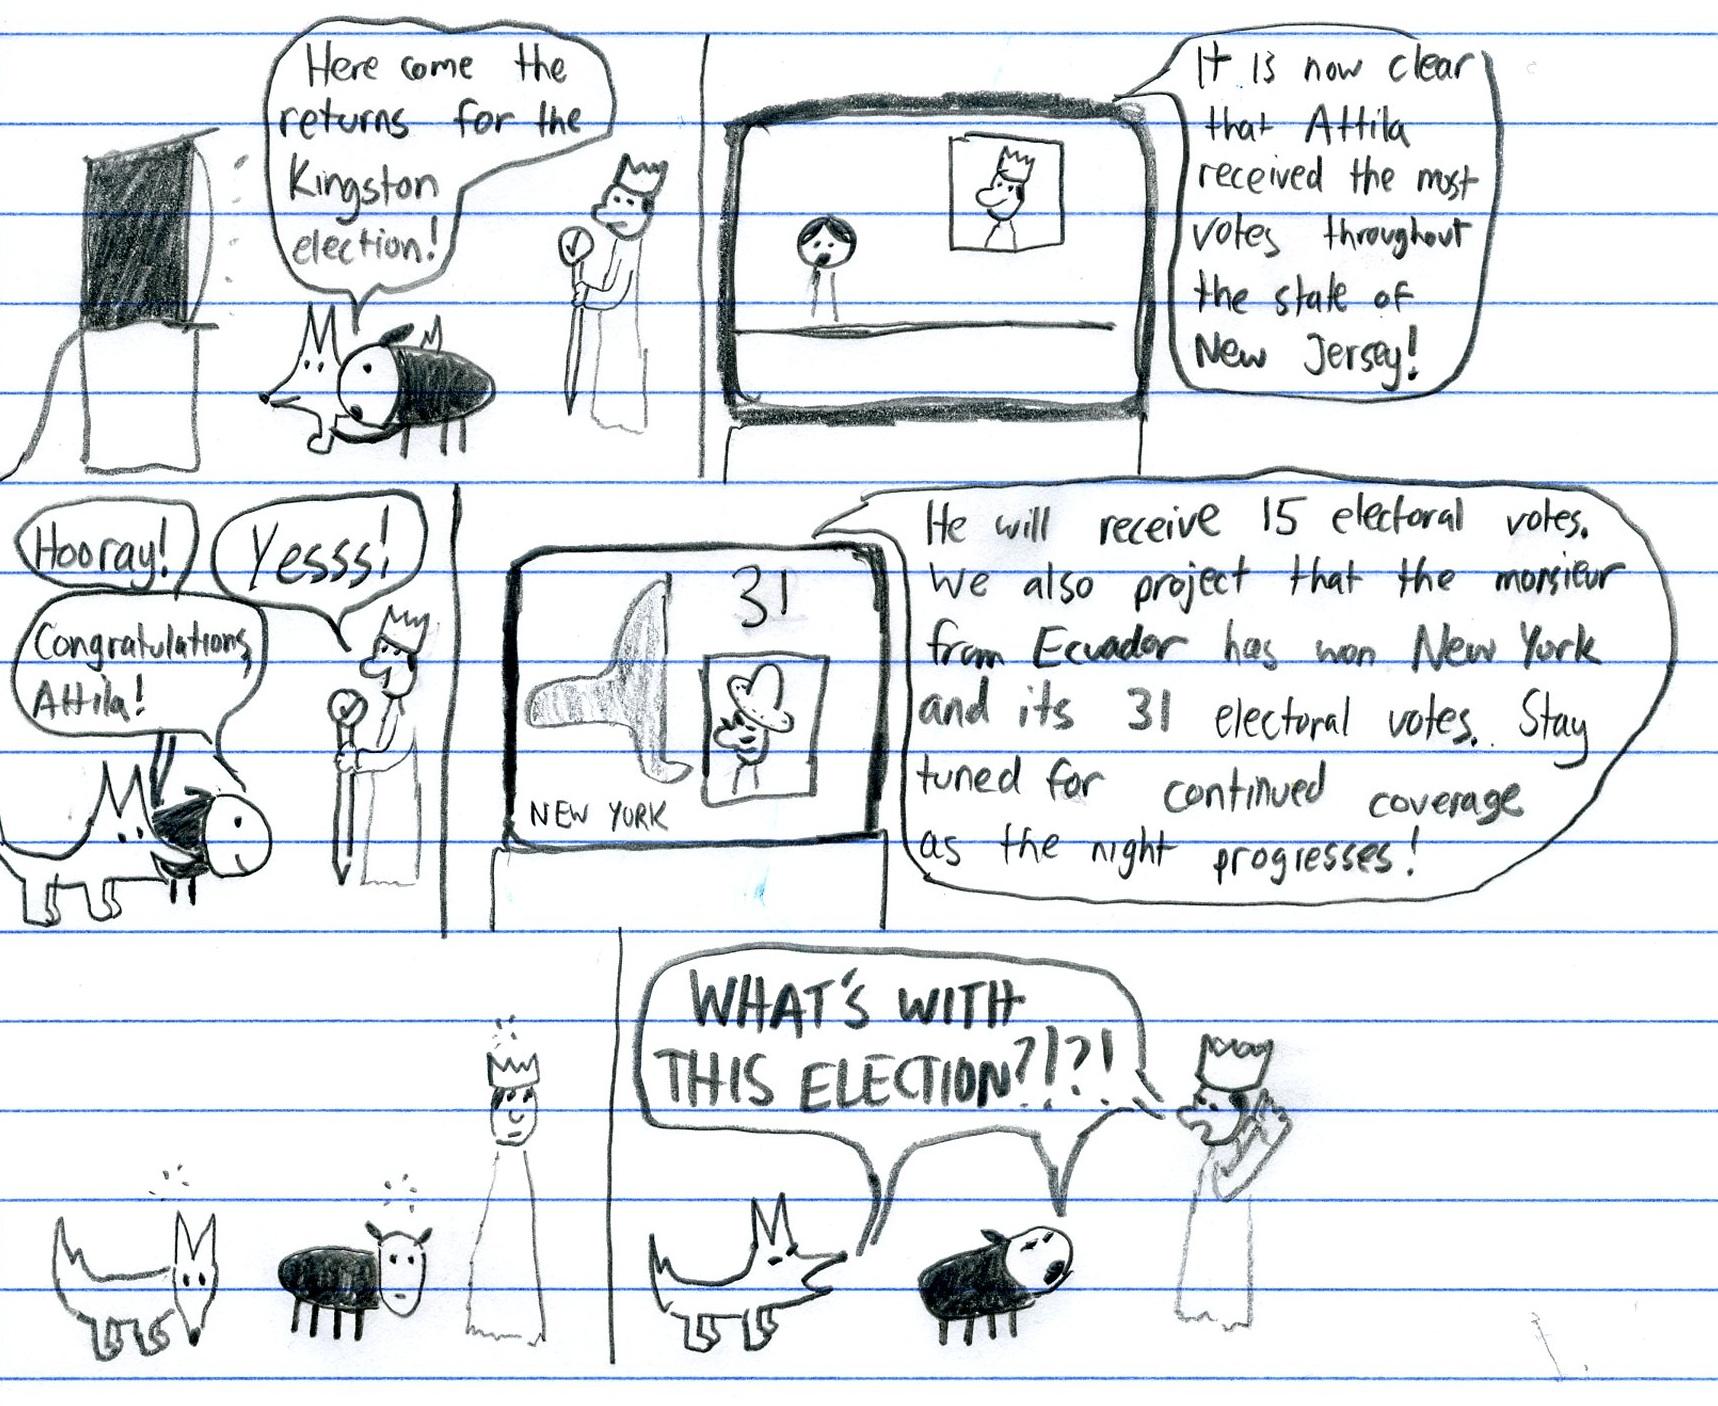 Election Returns